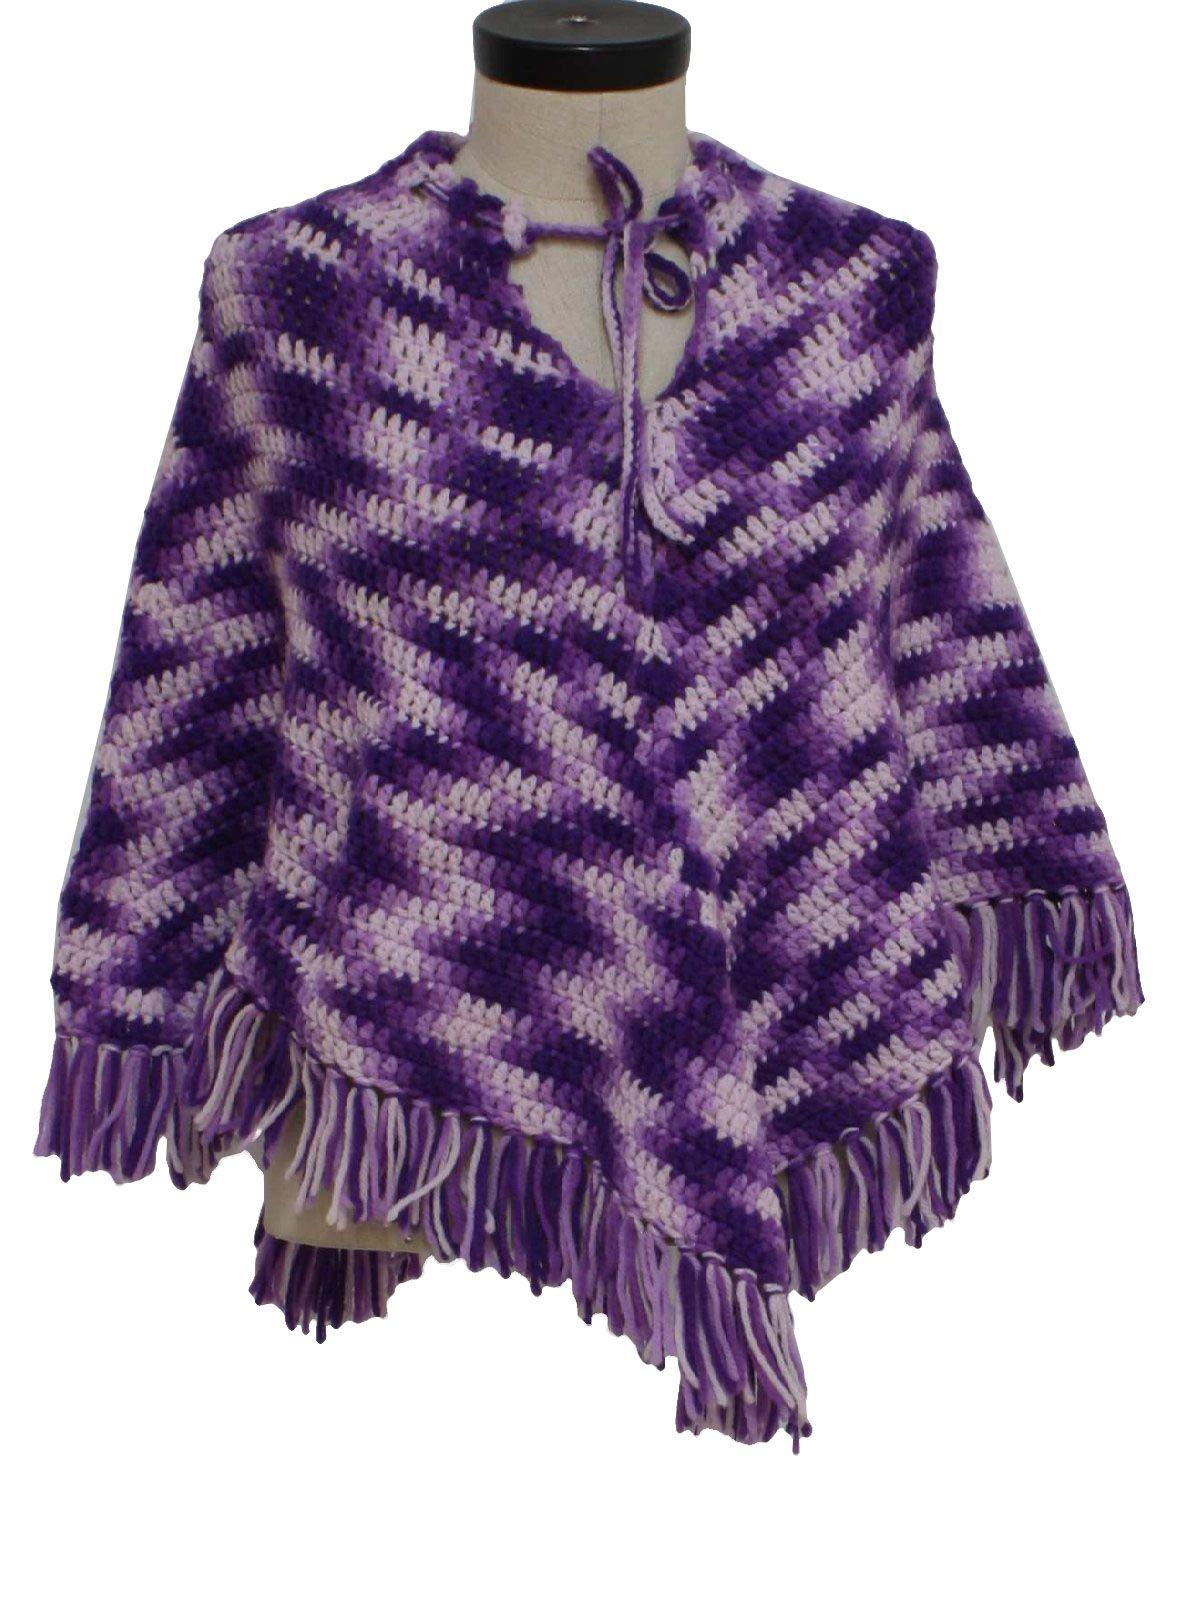 Freecrochetponchopatternsformen of purple acrylic crocheted freecrochetponchopatternsformen of purple acrylic crocheted bankloansurffo Images